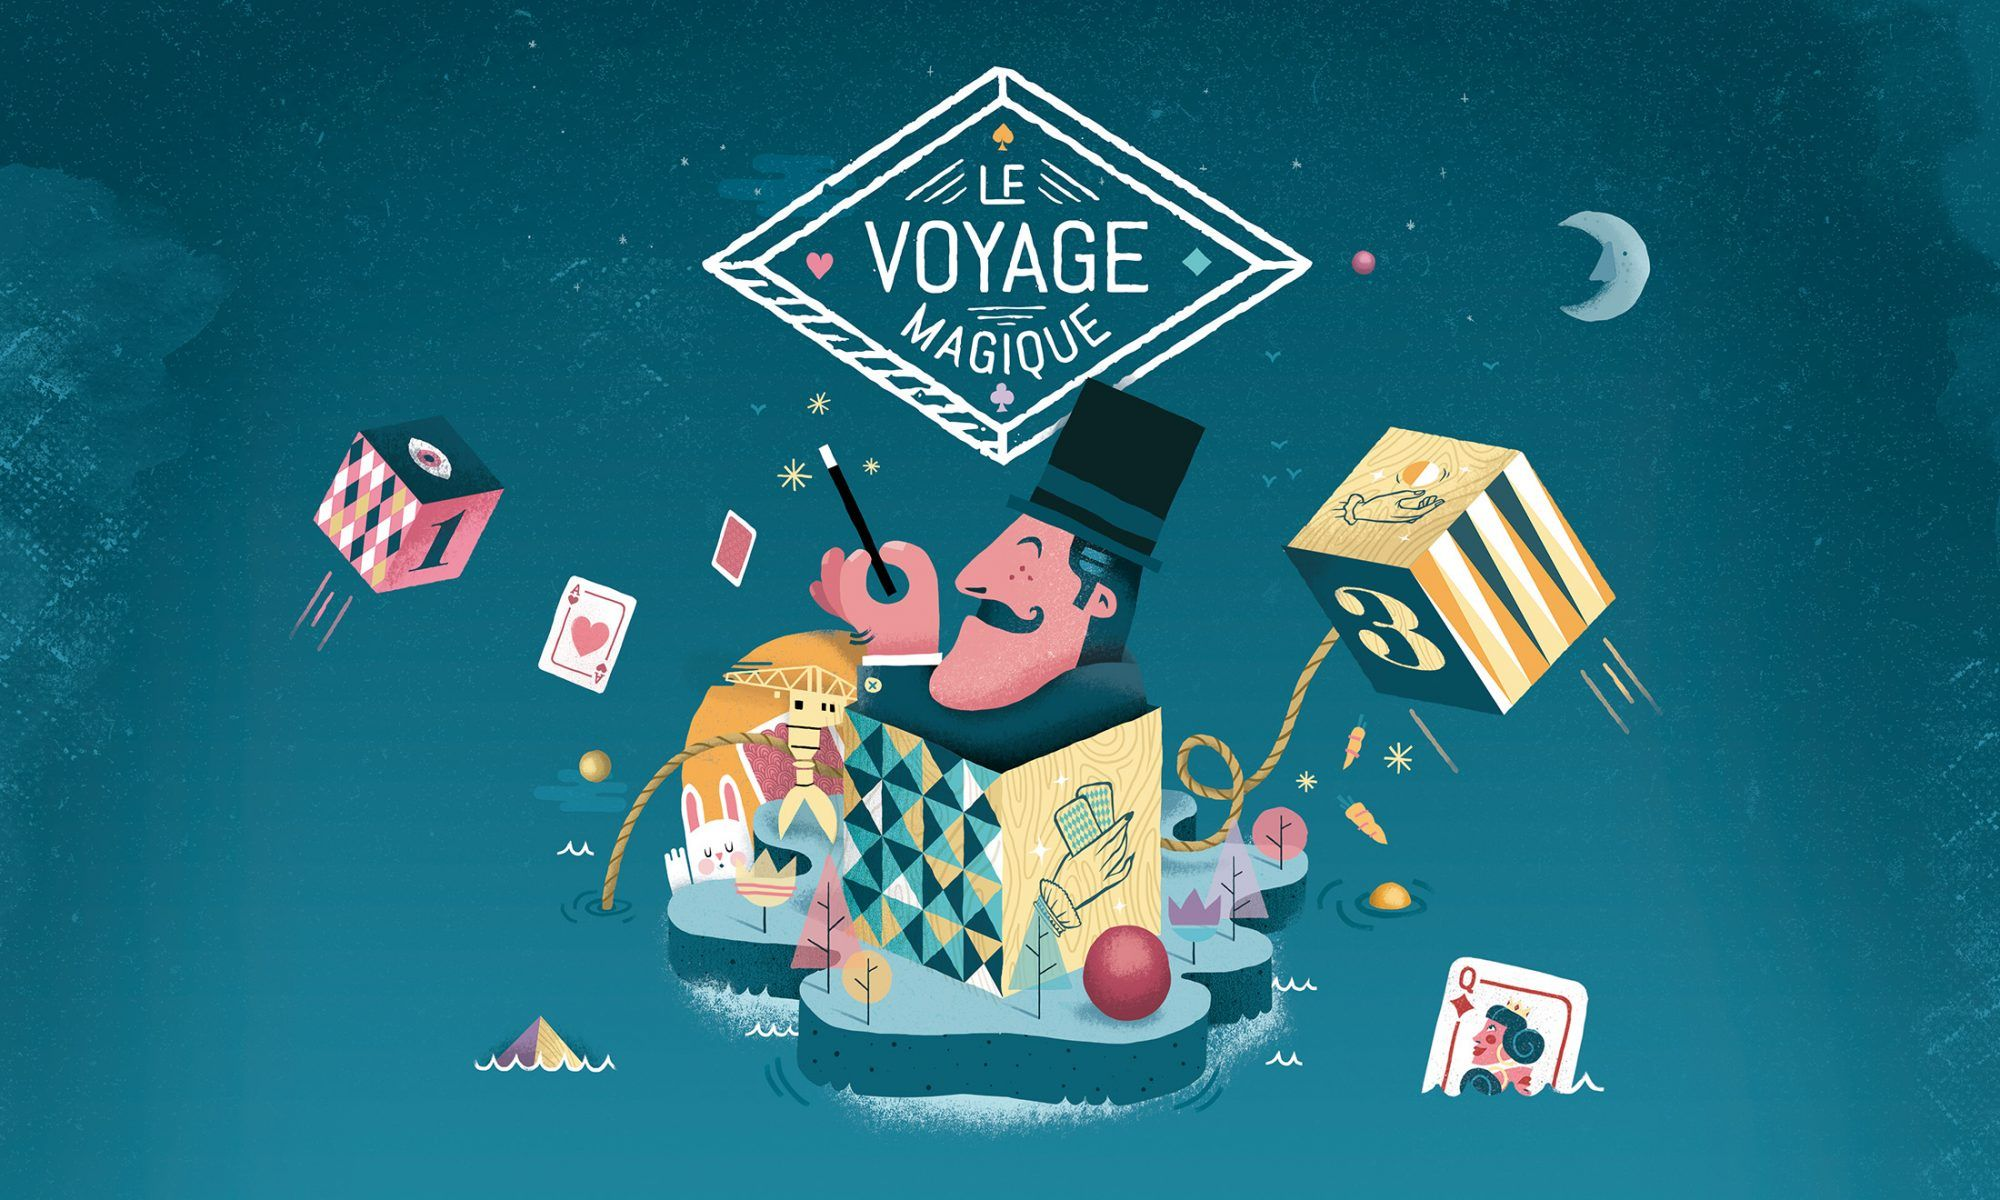 Visuel_VoyageMagique_OK